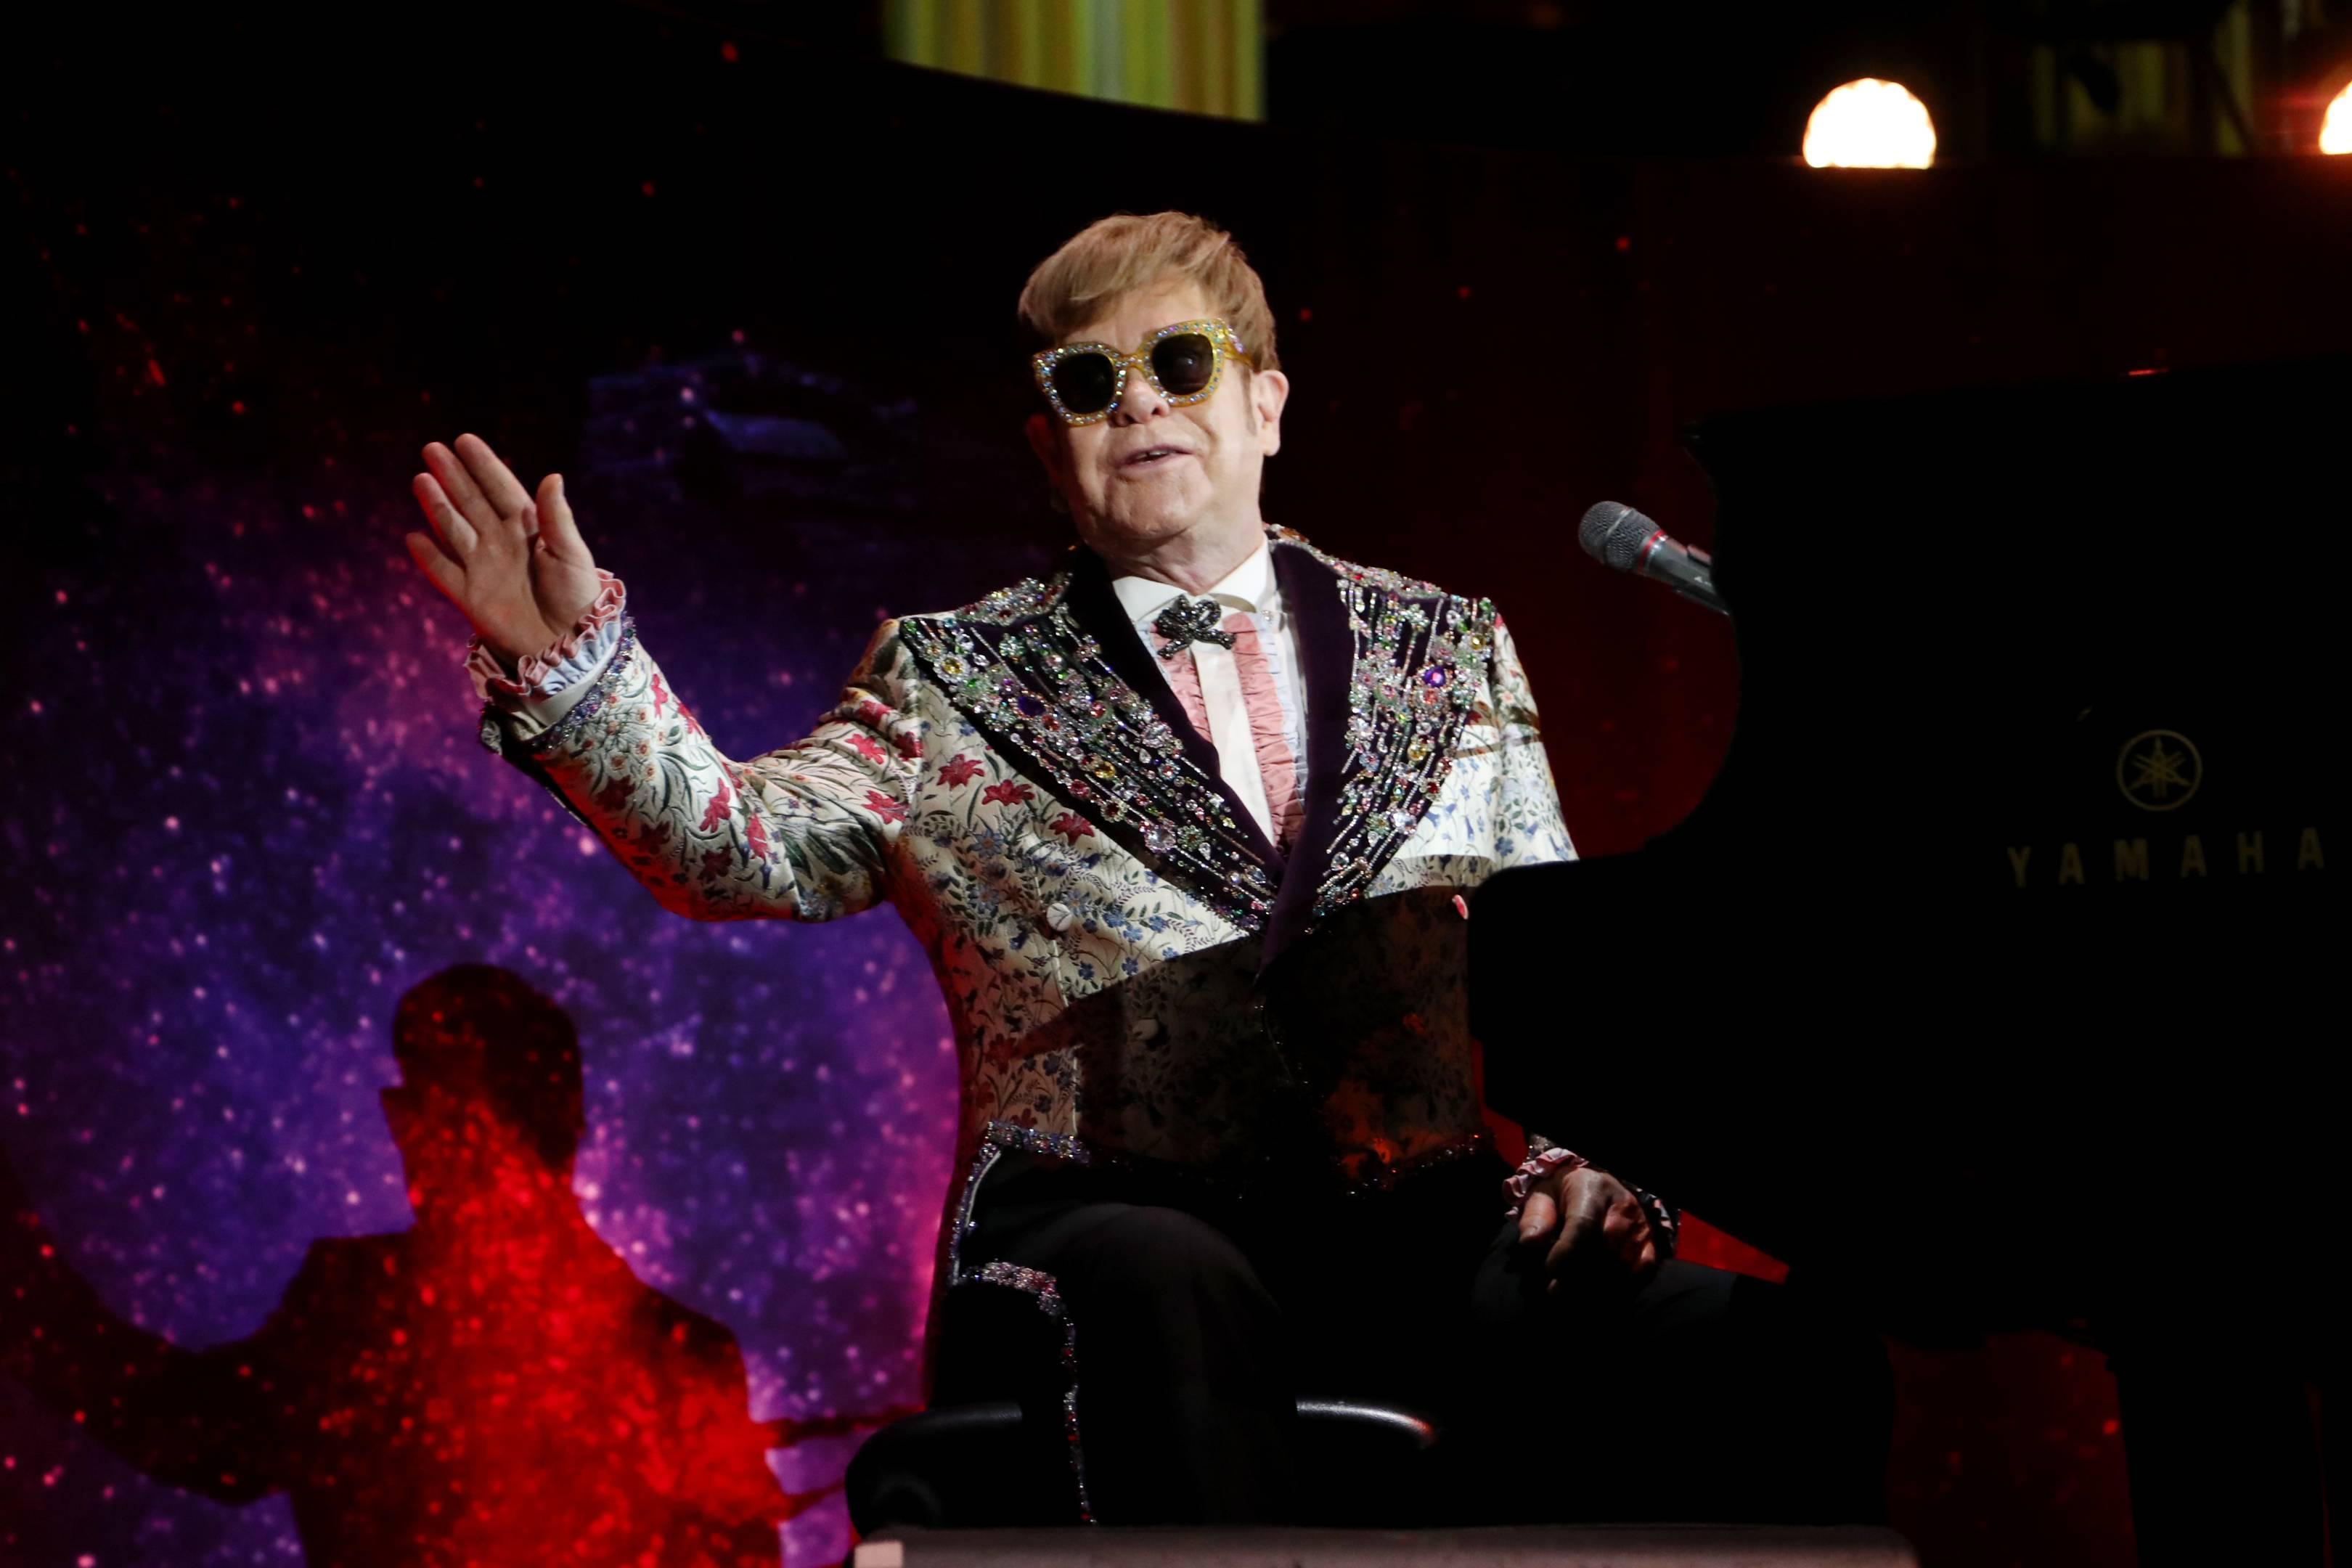 Elton John s Farewell Tour Will Be A Fabulous Flashy Gucci Explosion e16372a16d6c